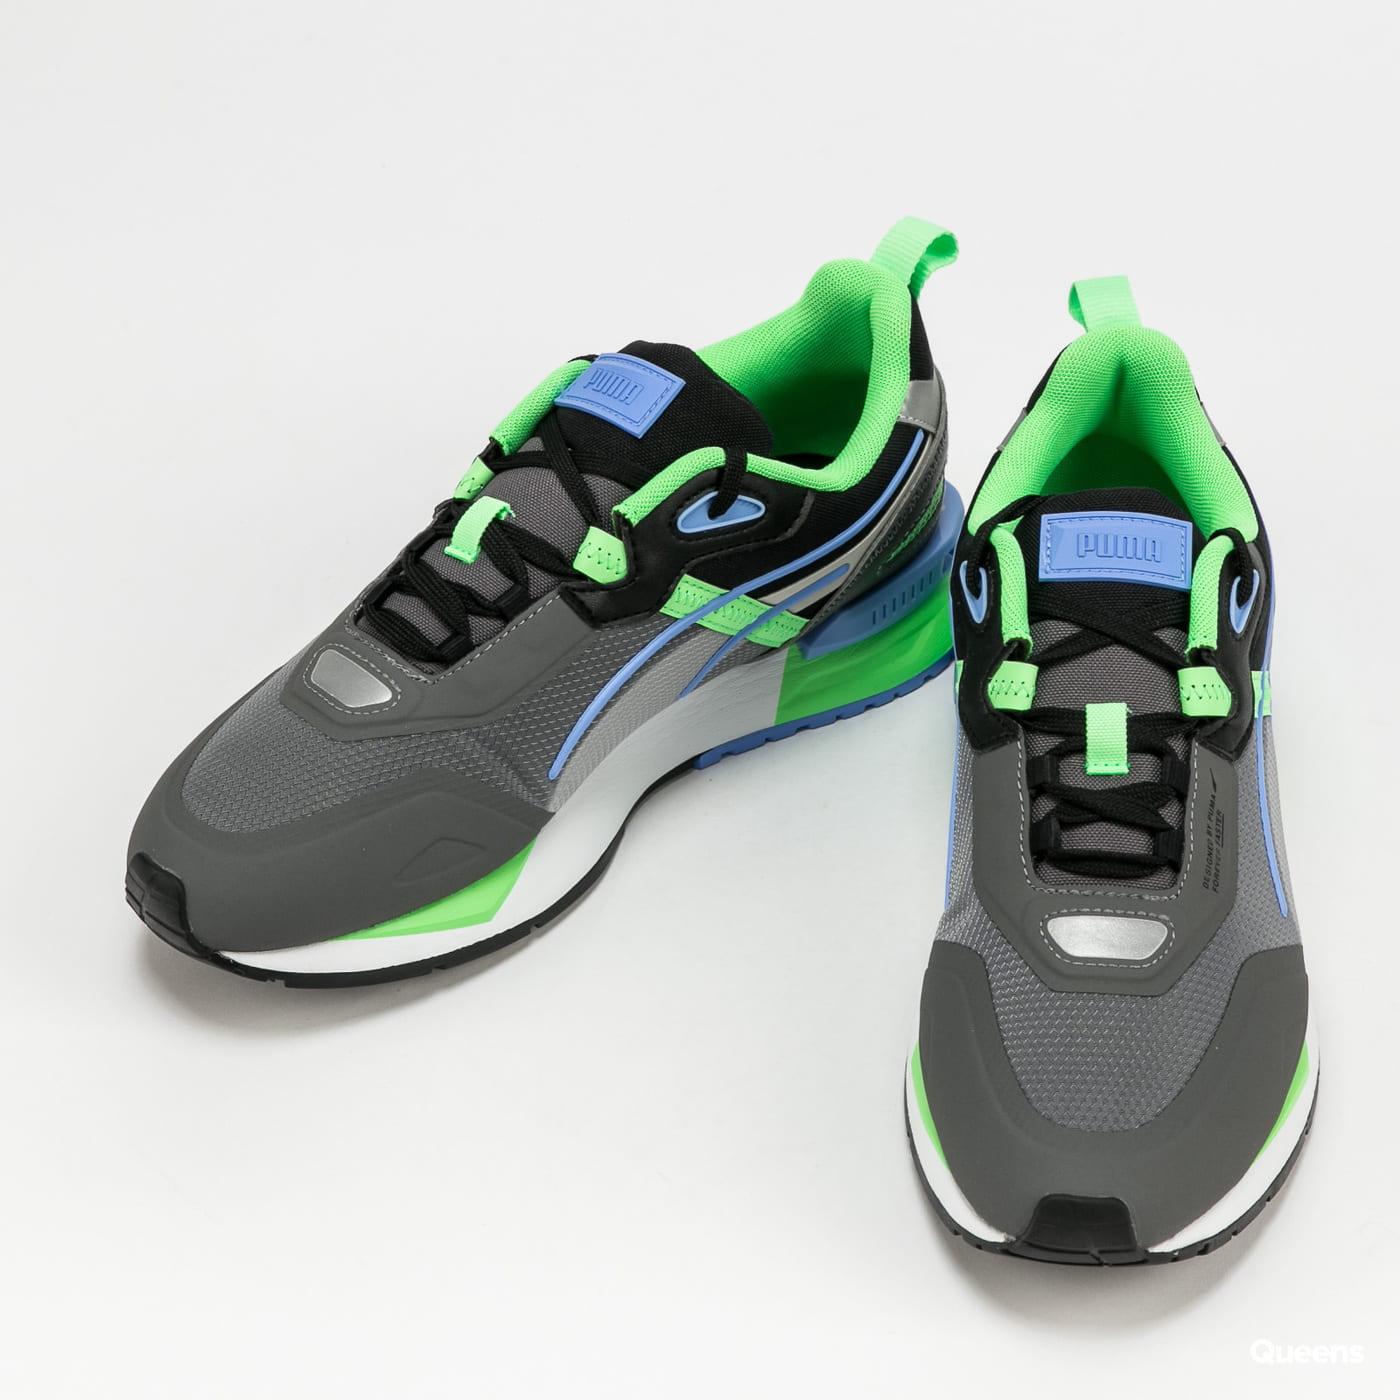 Puma Mirage Tech castlerock - elektro green